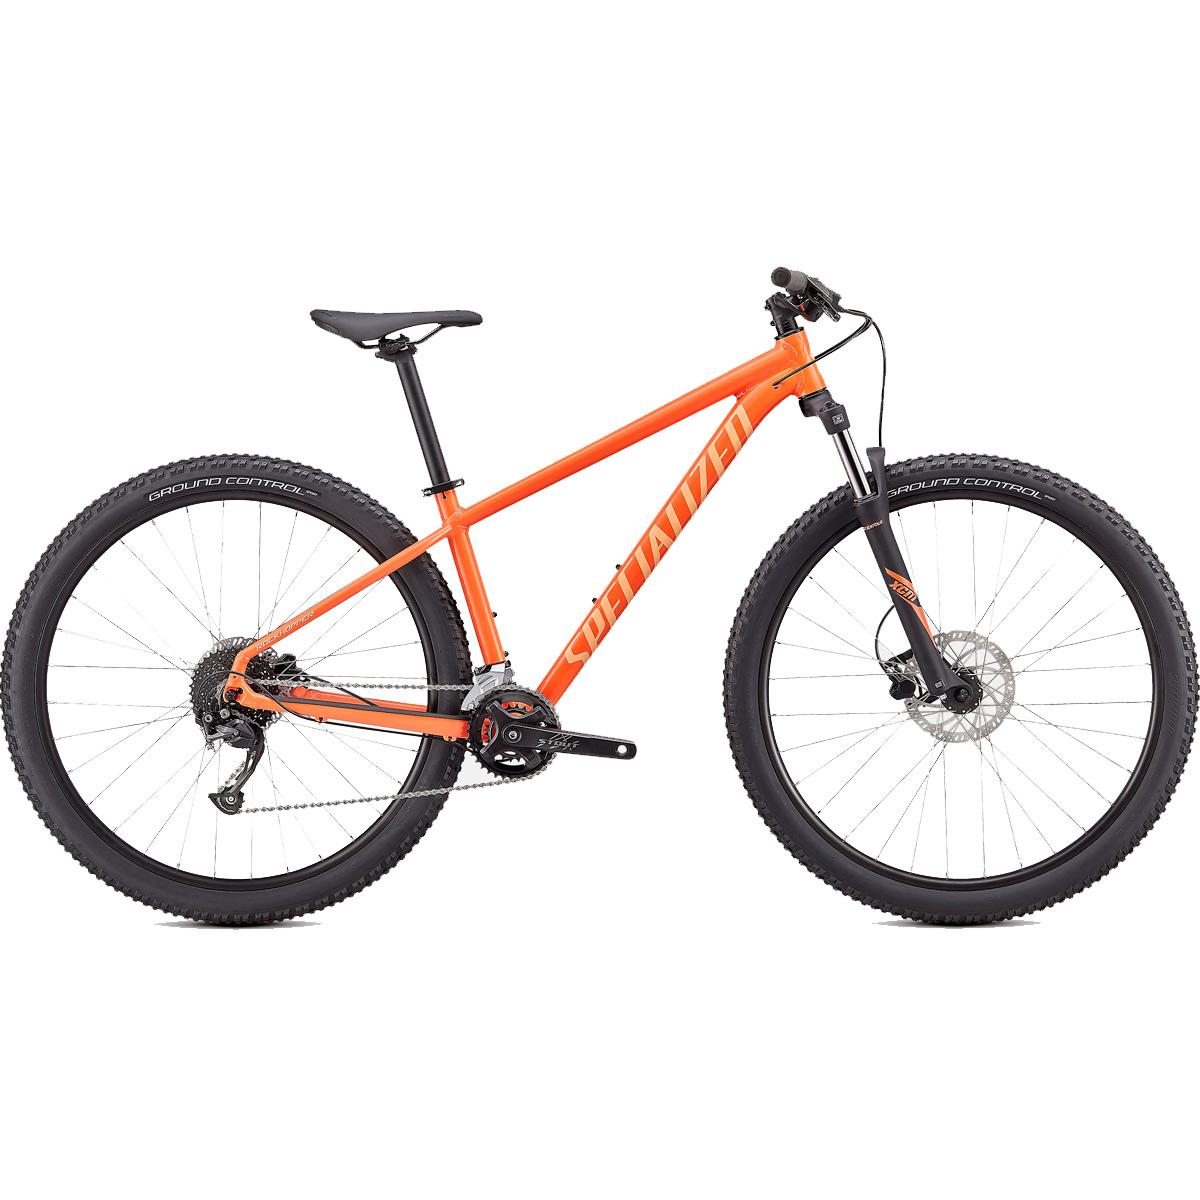 Bicicleta Rockhopper Sport 29